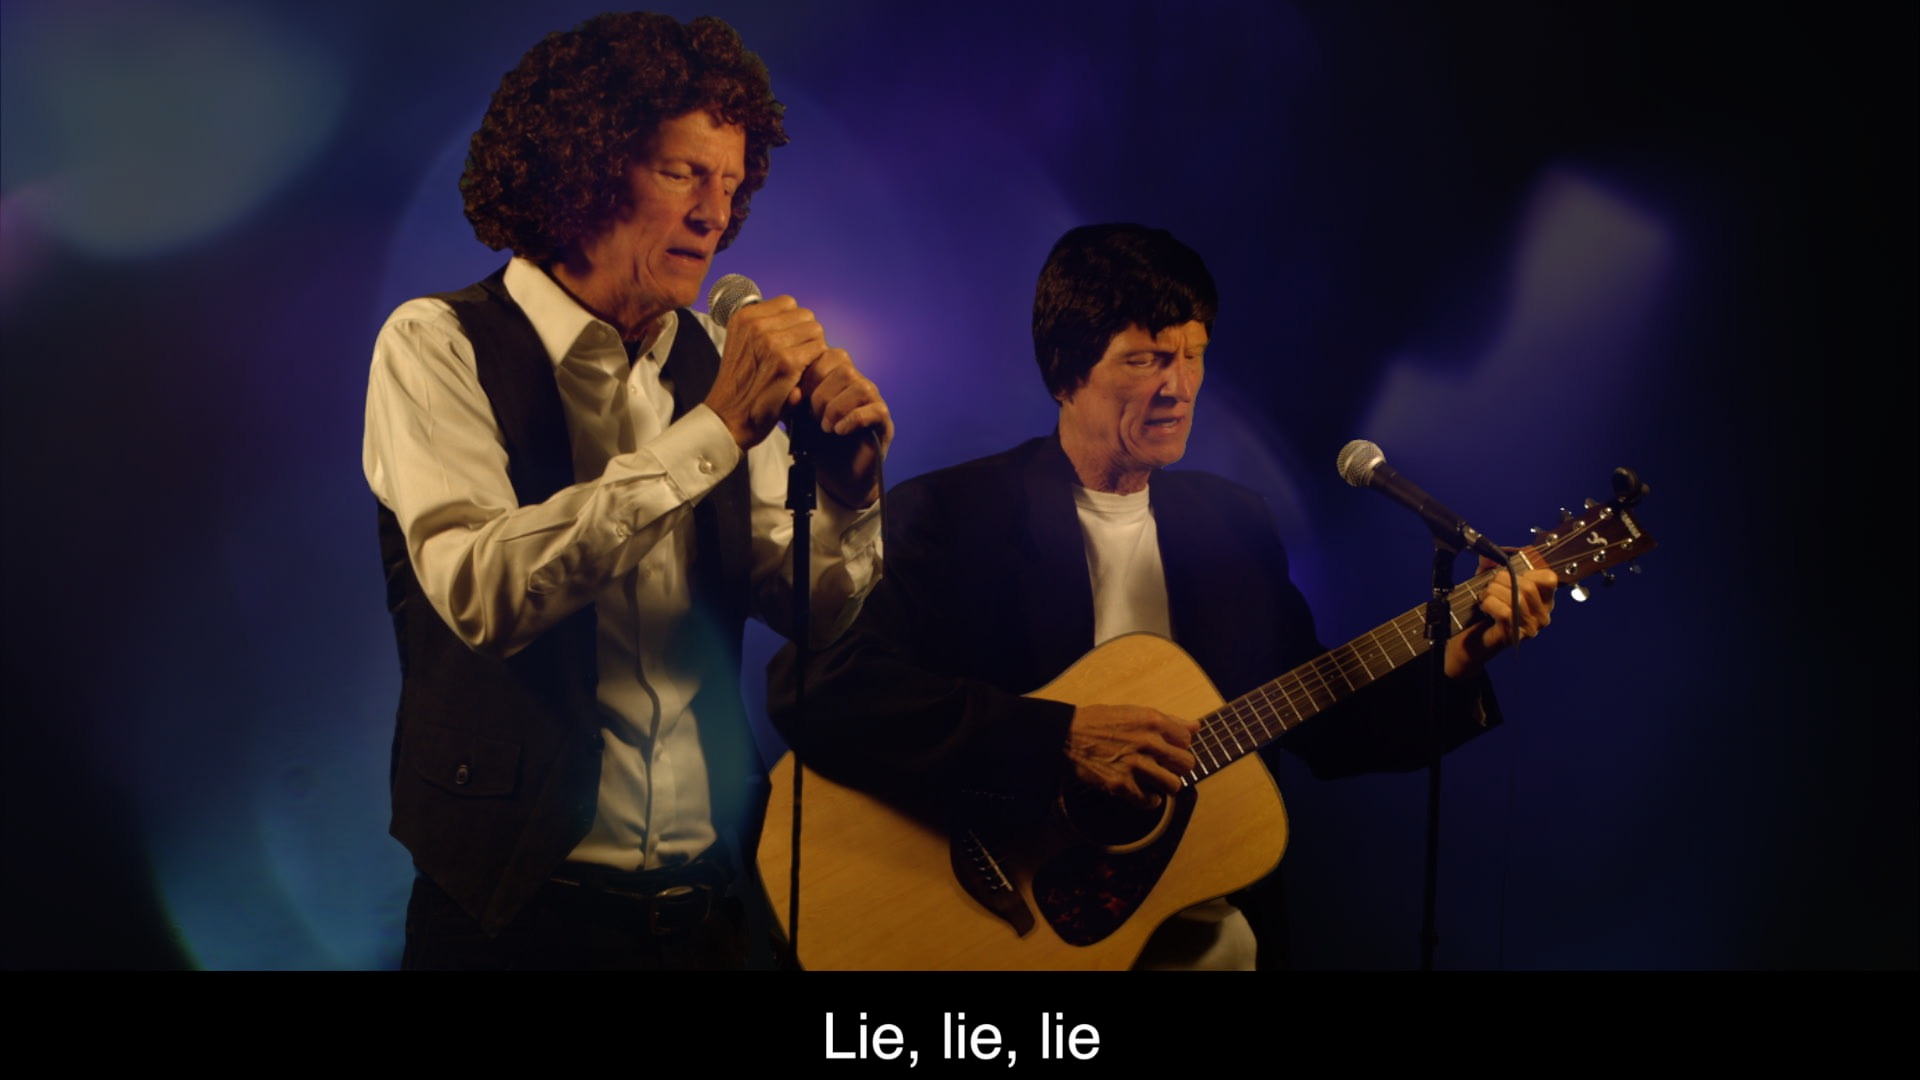 LIE LIE LIE – Parody